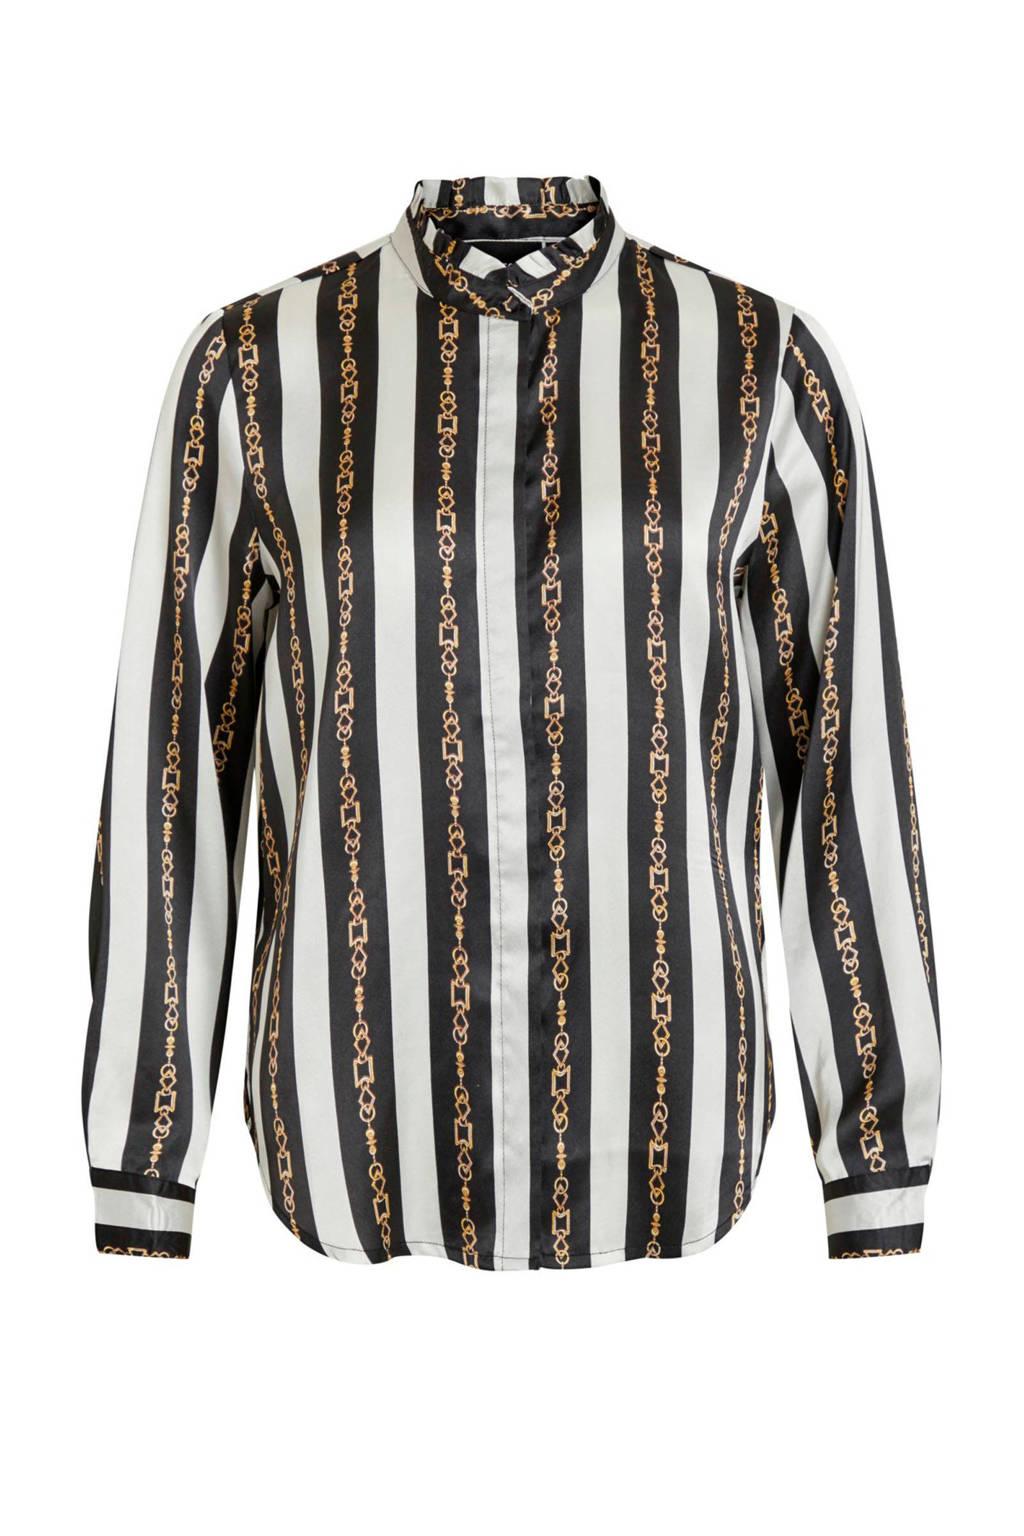 OBJECT gestreepte satijnen blouse zwart/wit/goud, Zwart/wit/goud